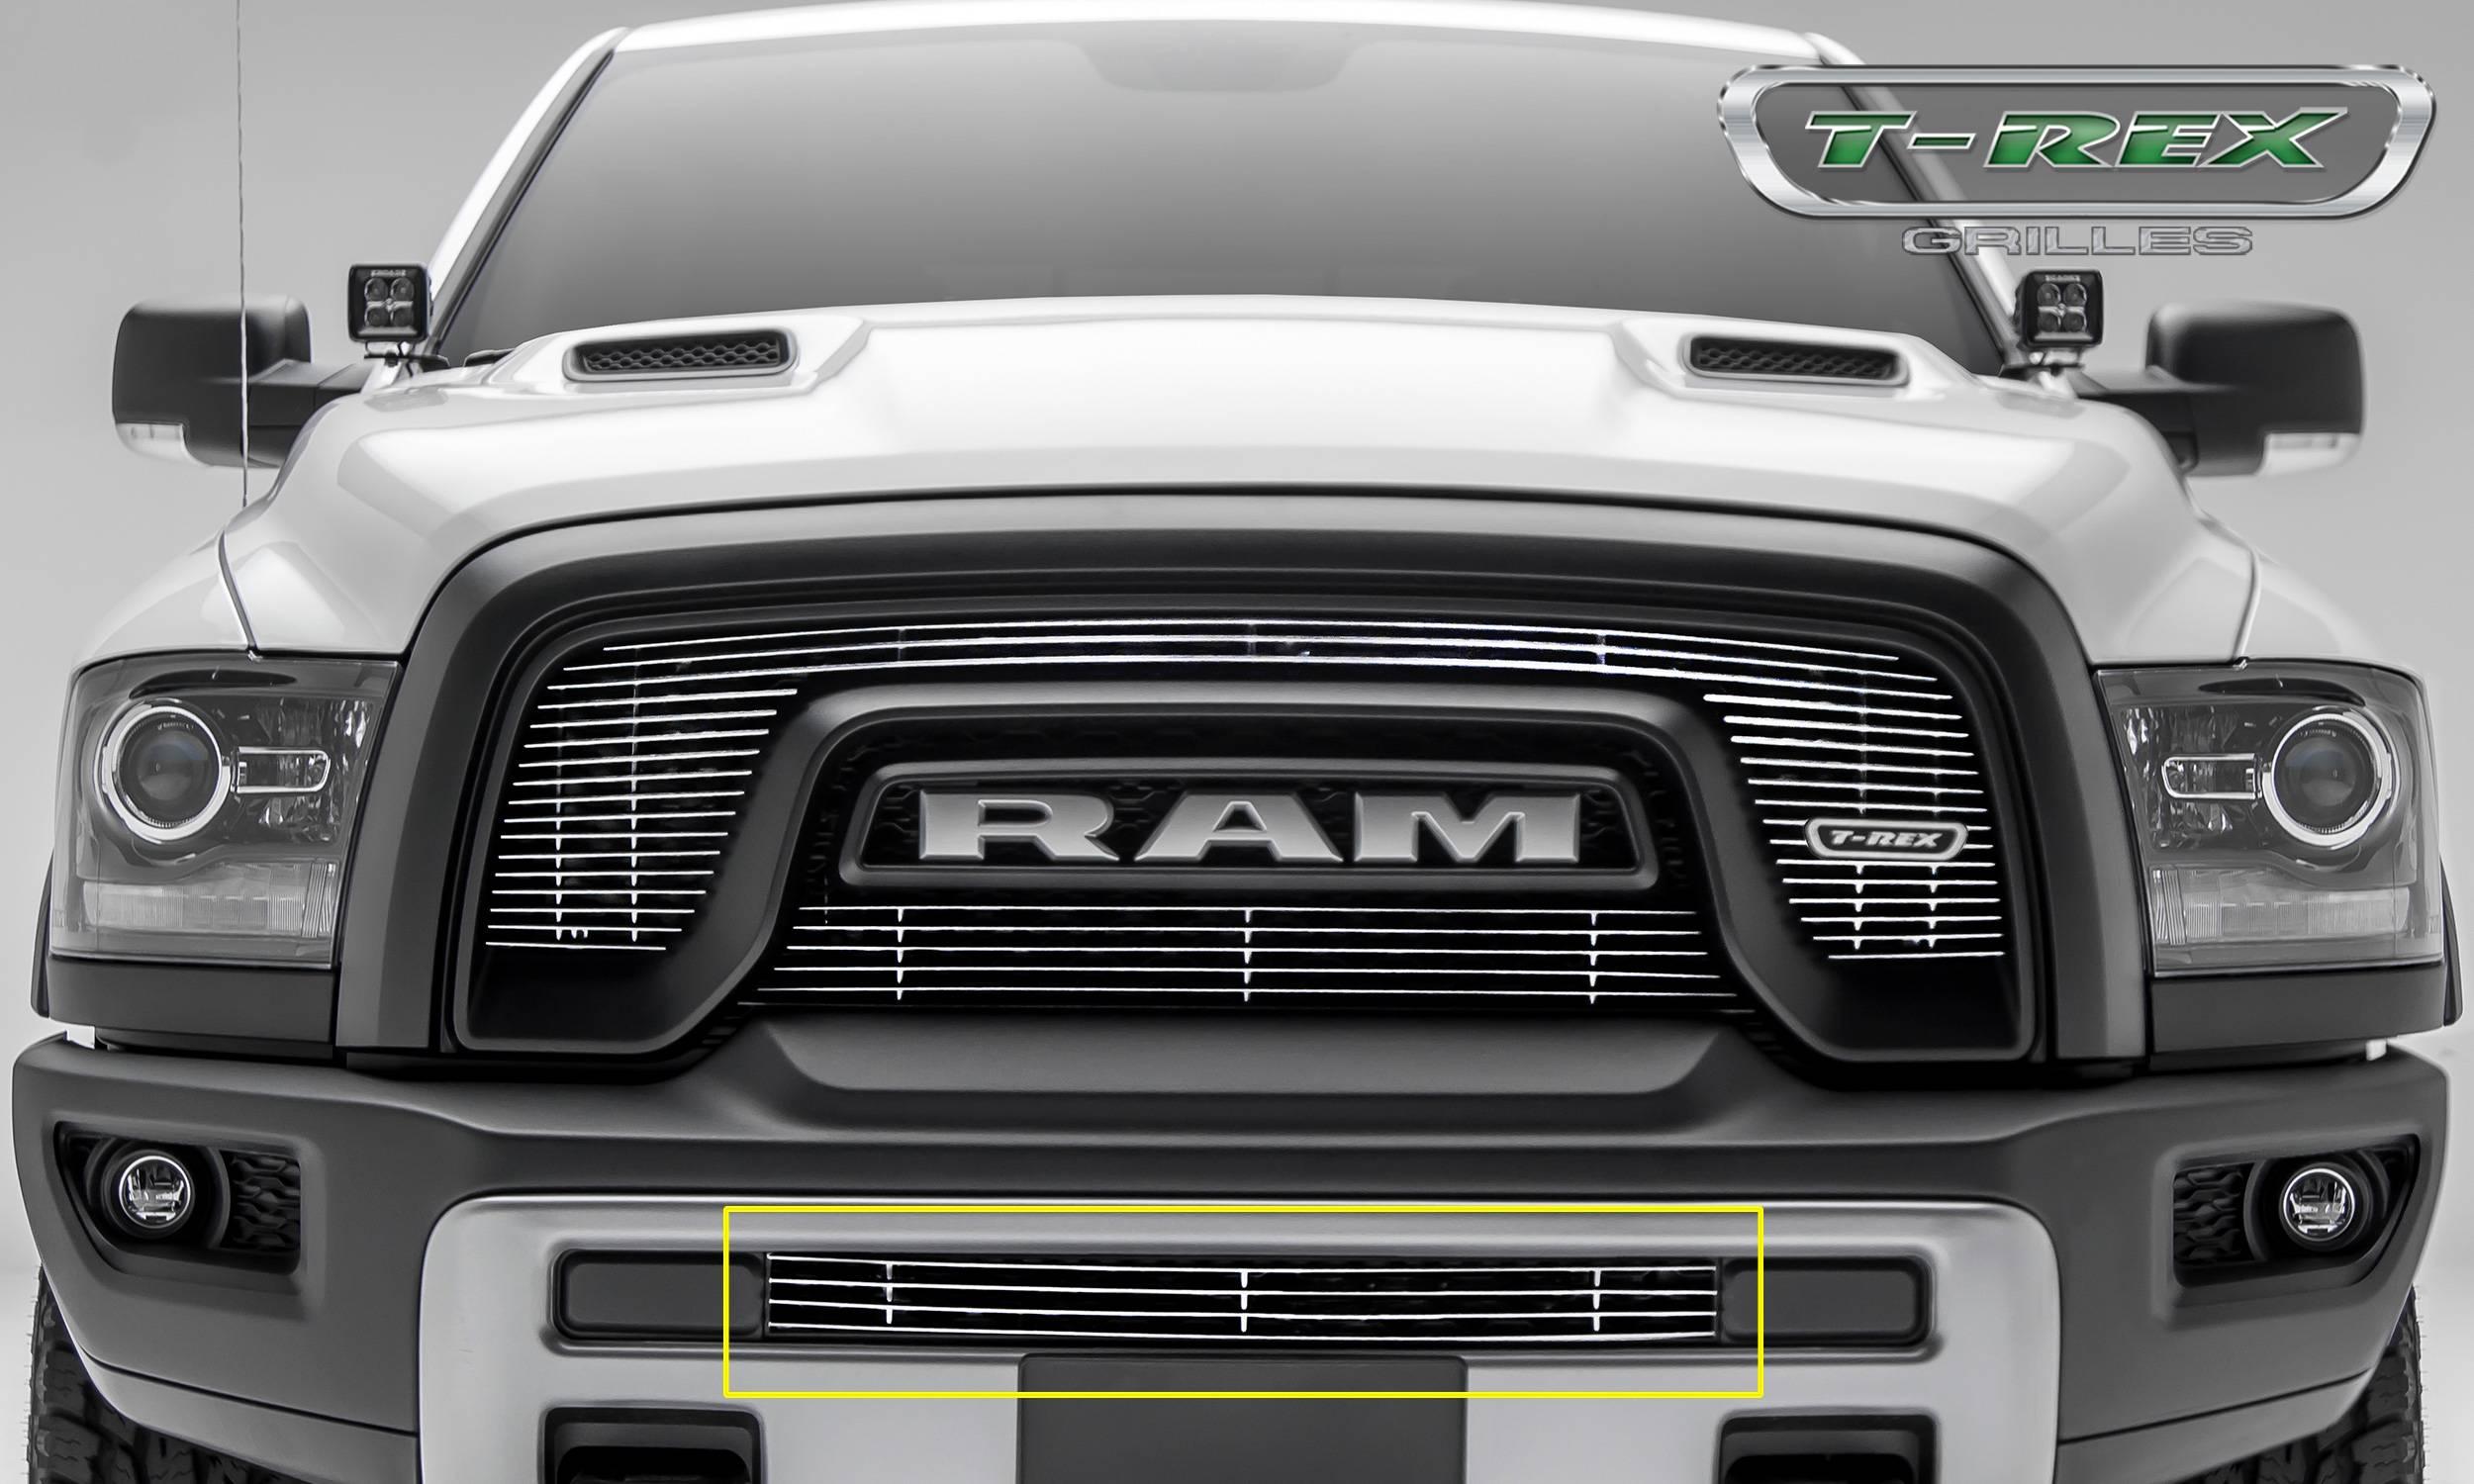 T Rex Ram Rebel Billet Series Bumper Grille Overlay